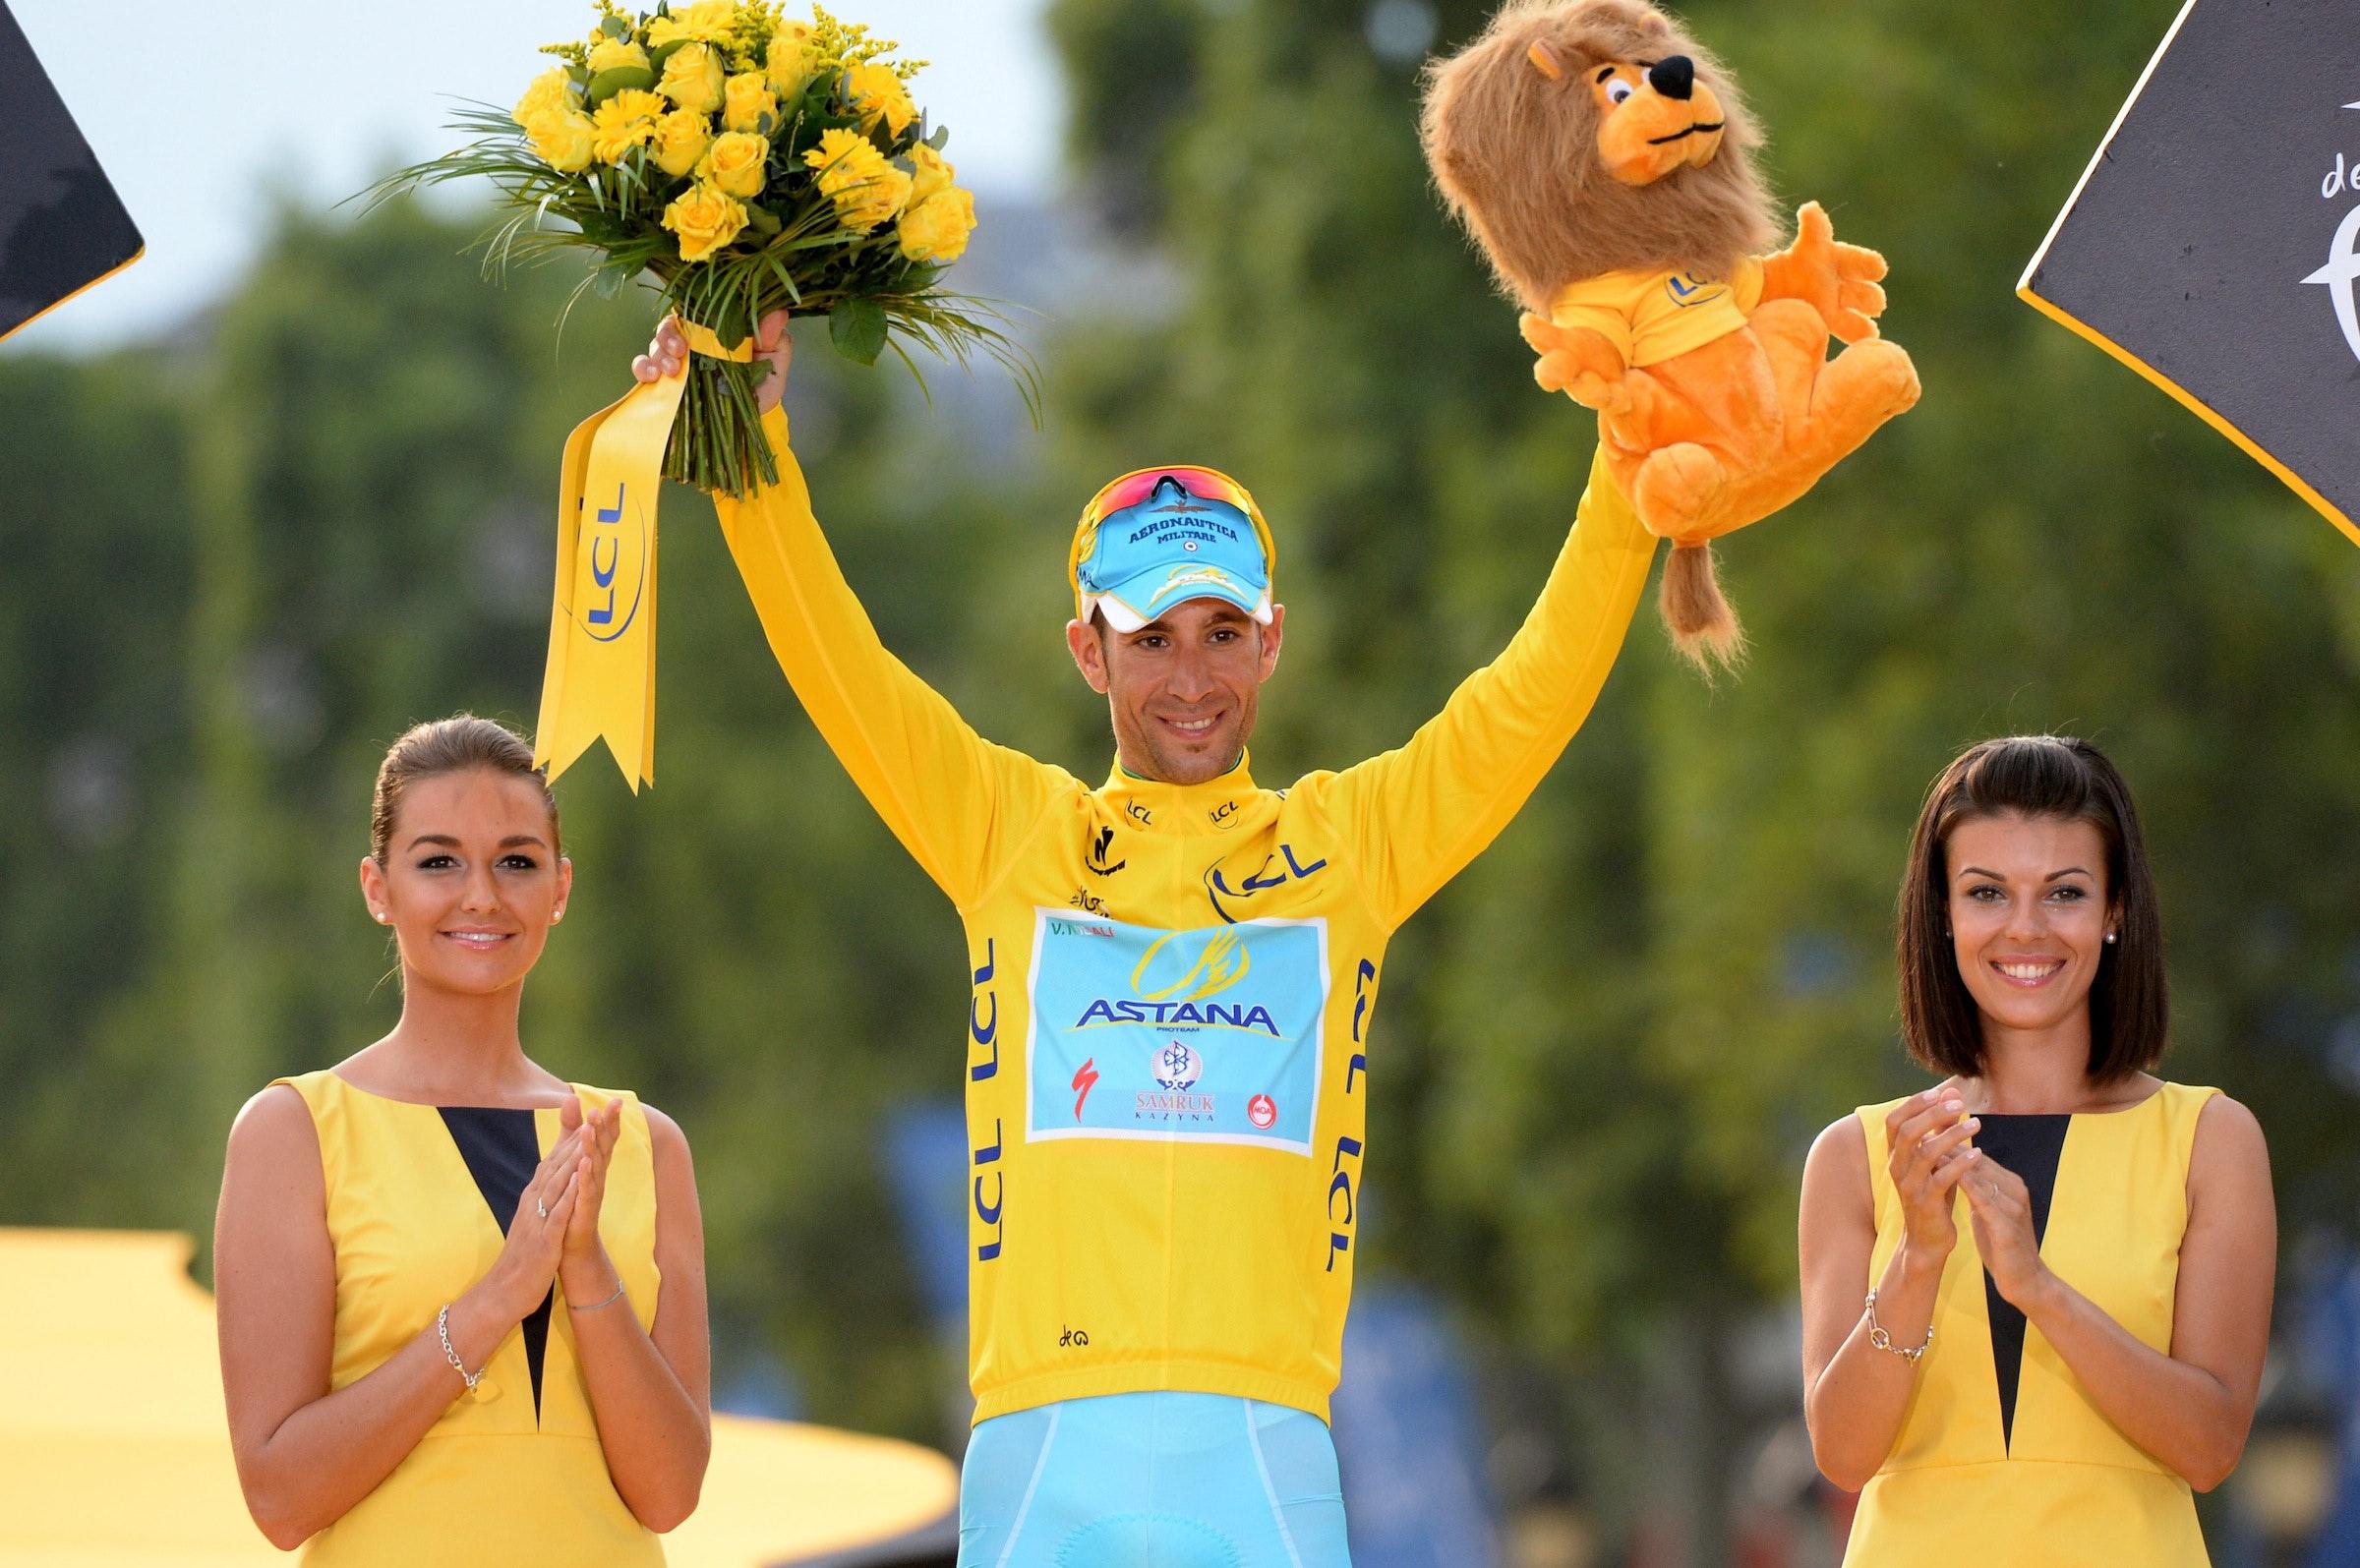 Vincenzo Nibali, Tour de France 2014, stage 21, podium, Paris, pic: ©Sirotti